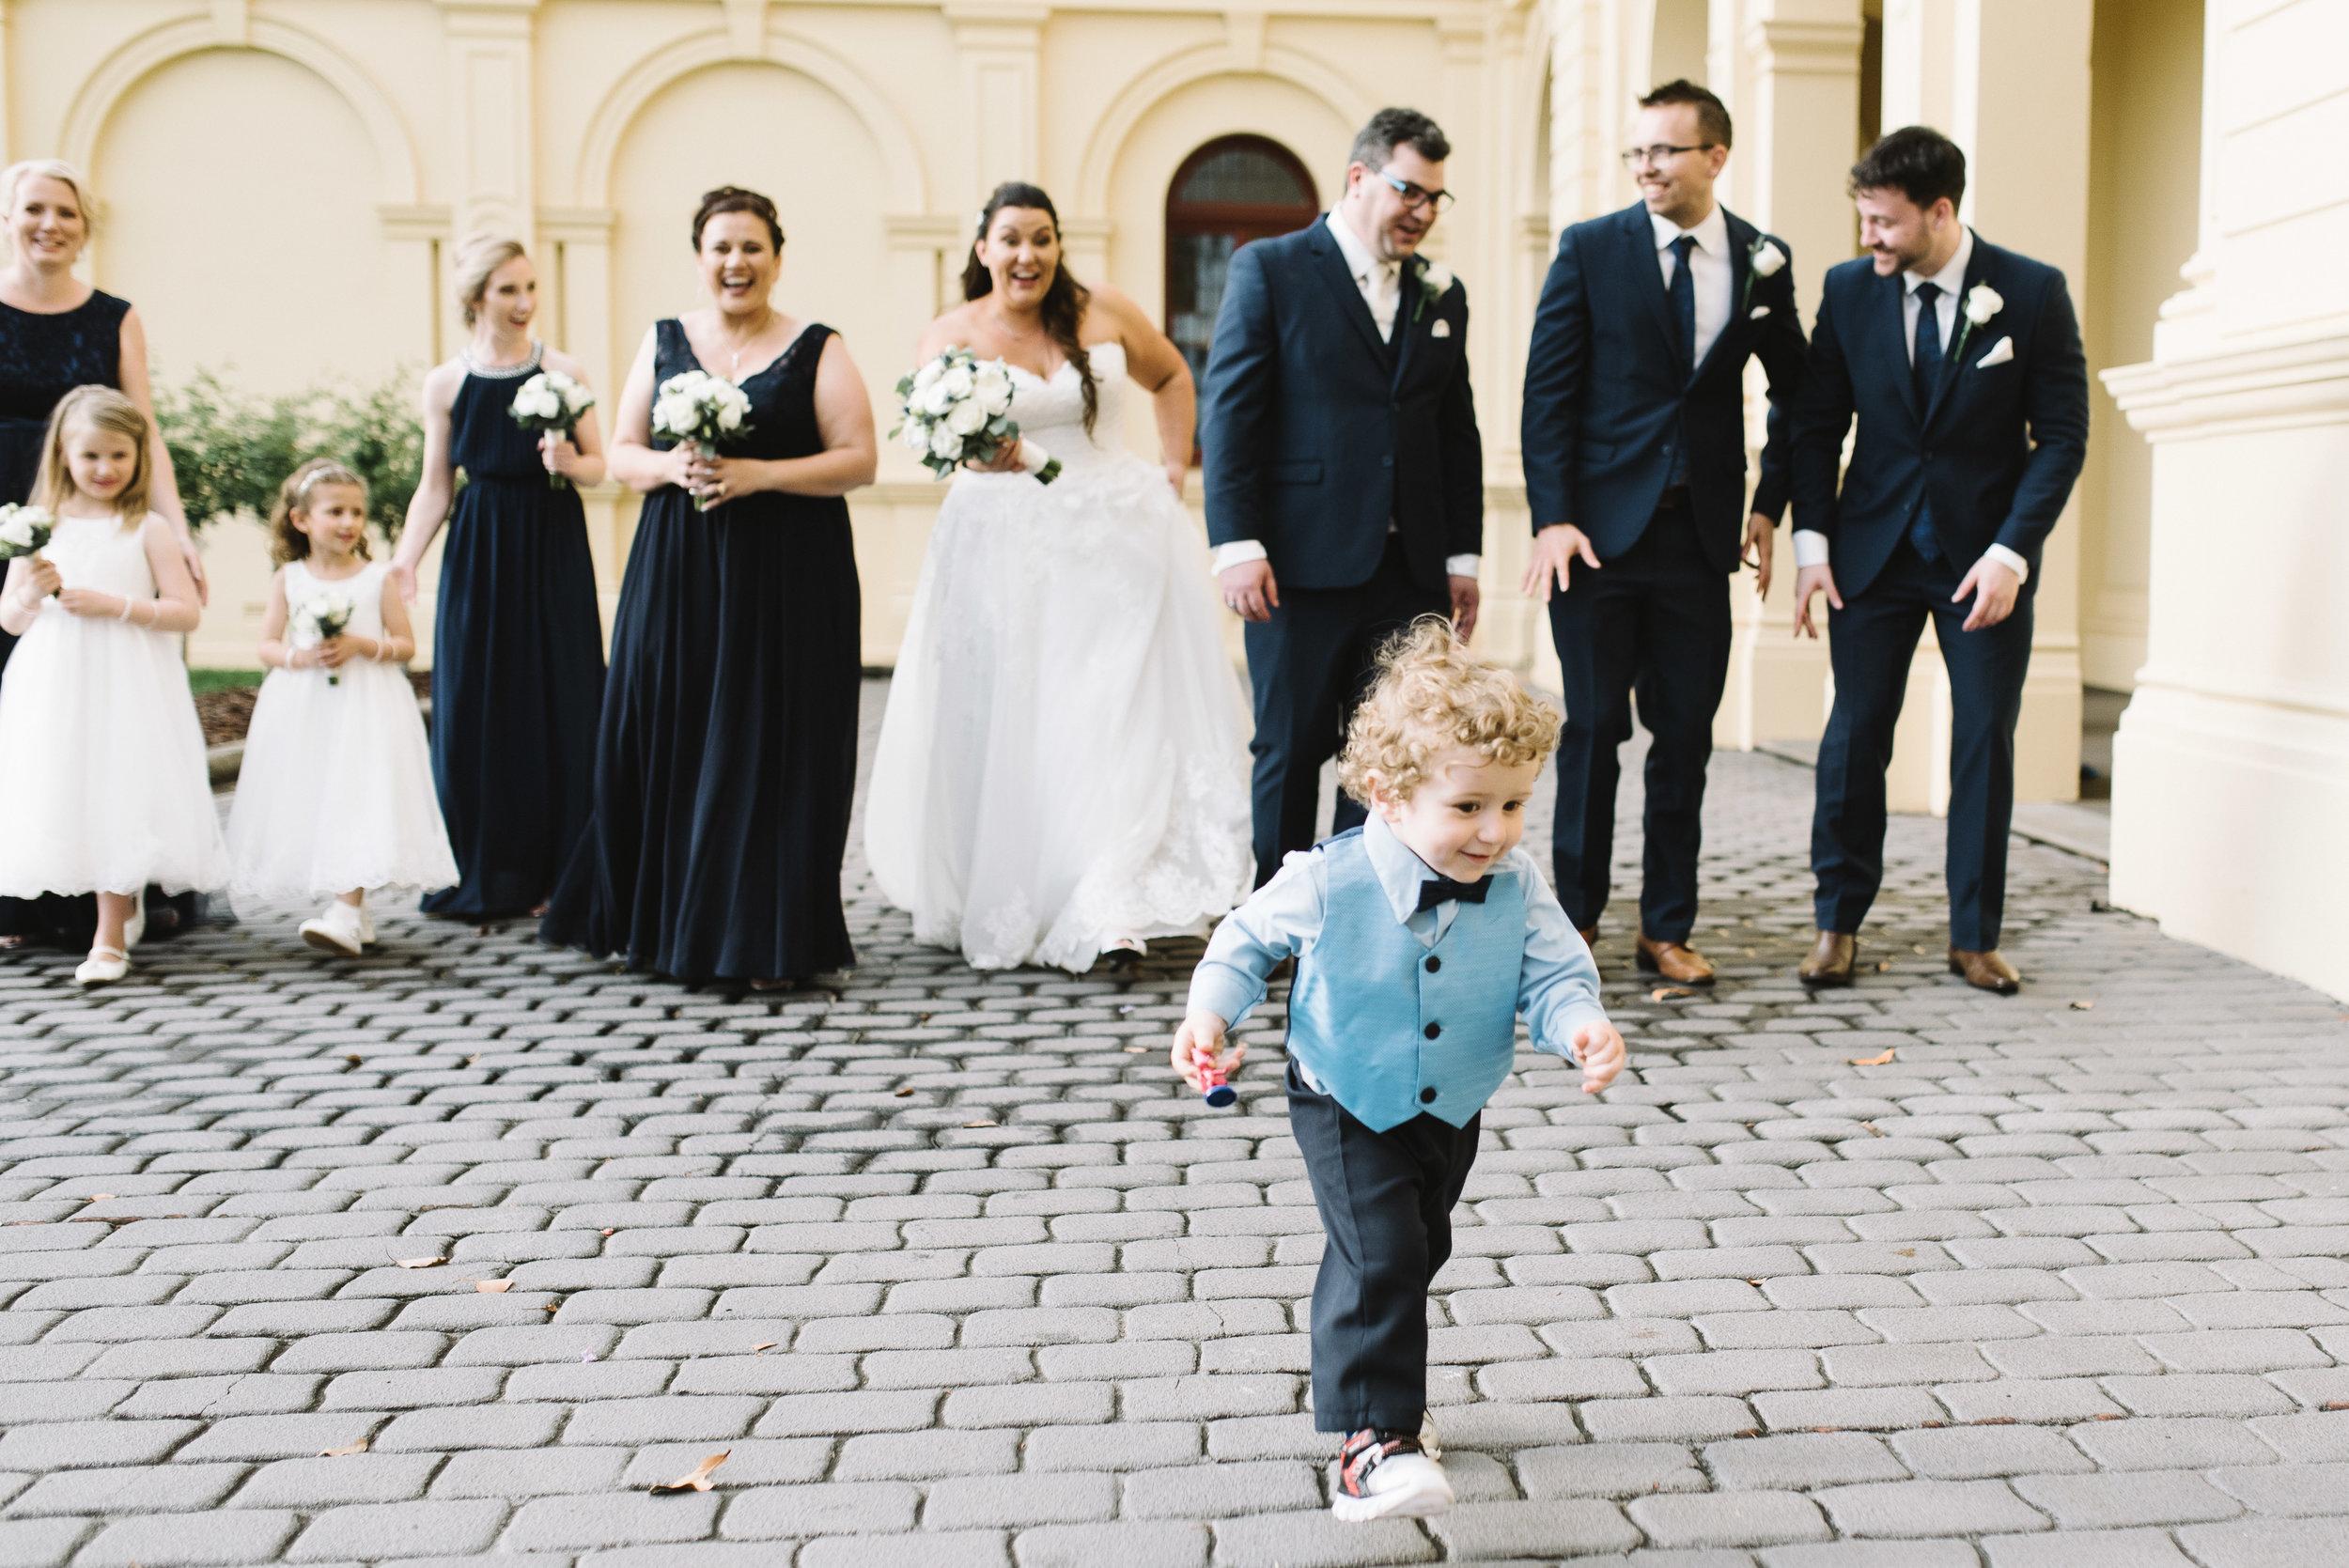 brisbane-wedding-photographer-67.jpg